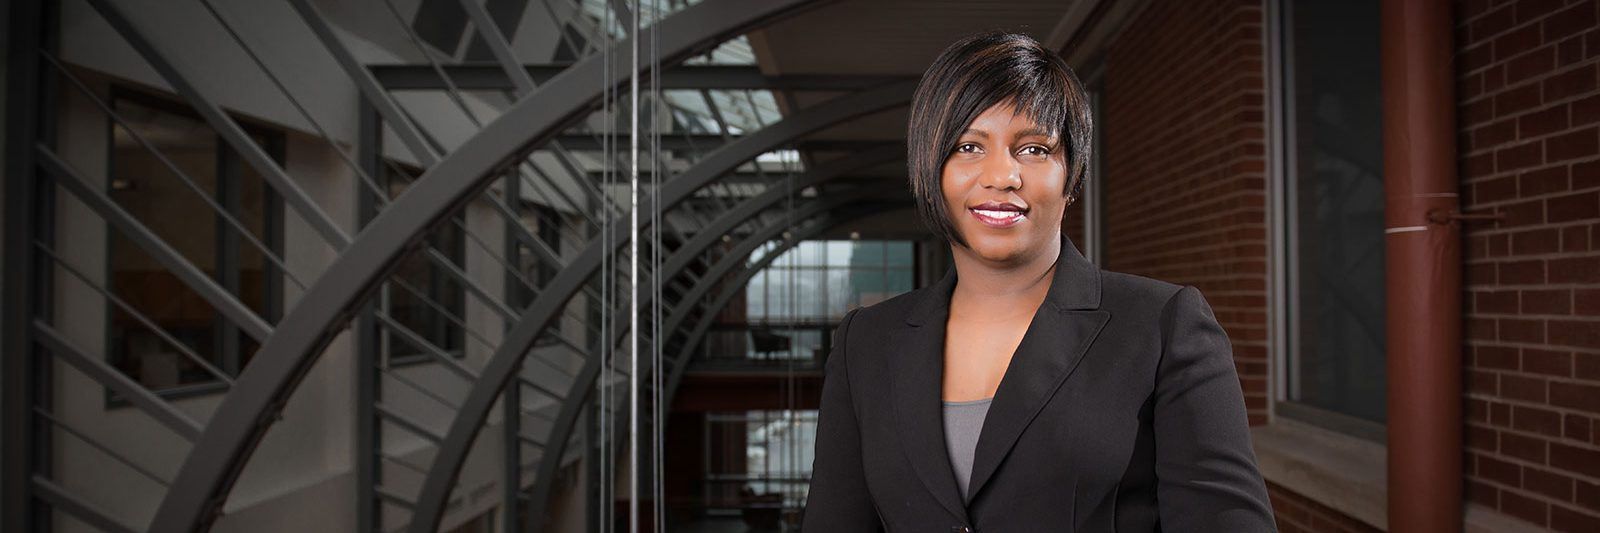 Dean Gladis Kersaint. Text Reads: Gladis Kersaint Named UConn Vice Provost for Strategic Initiatives.